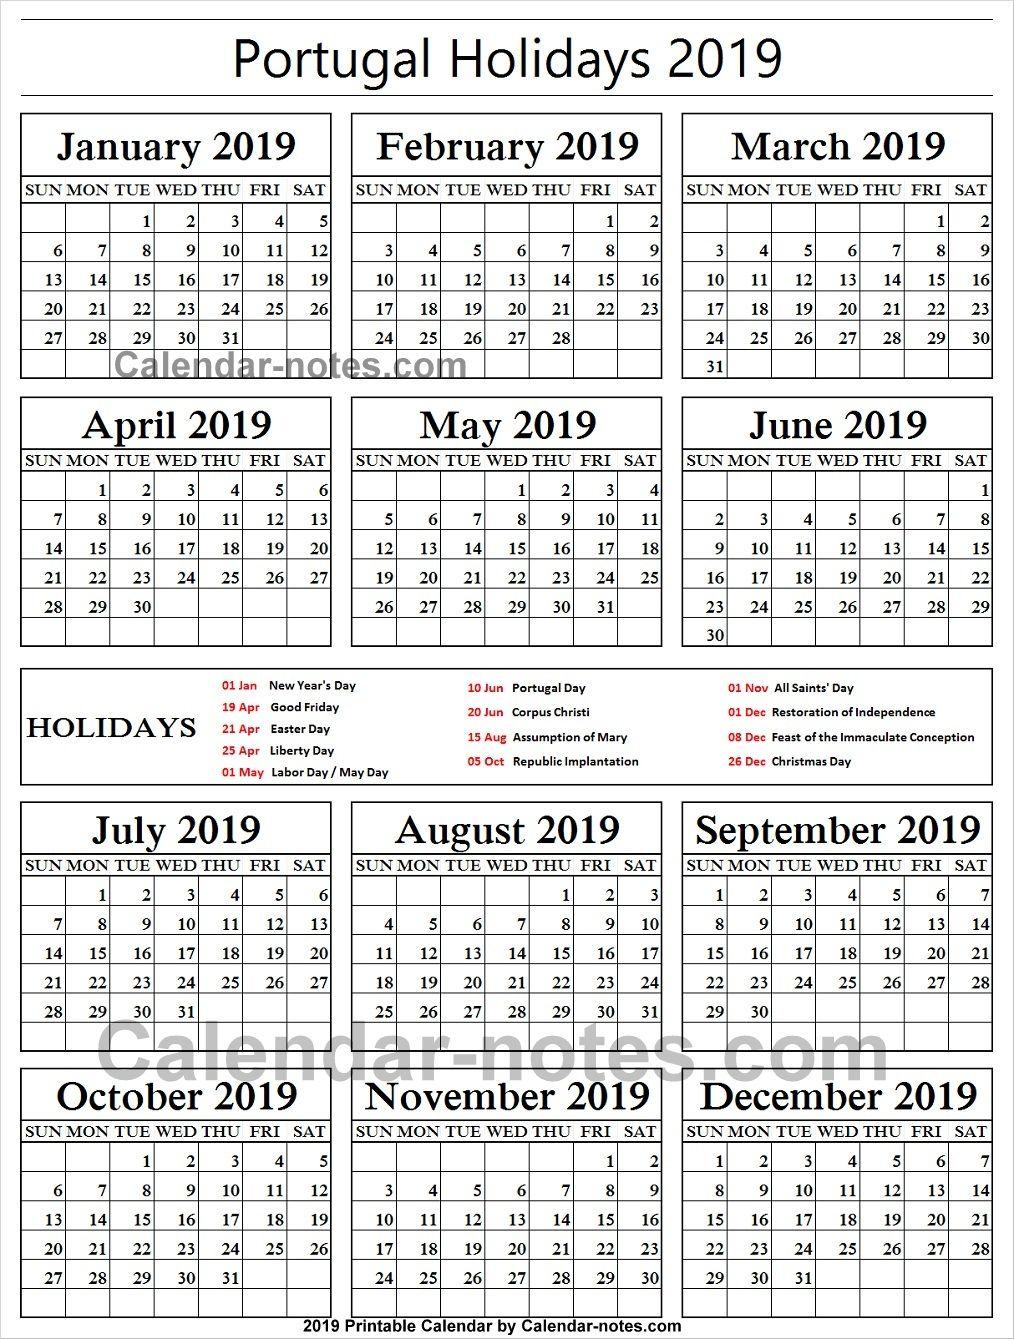 Christmas Holidays 2019 Calendar.Portugal Holiday 2019 Calendar School Holidays National